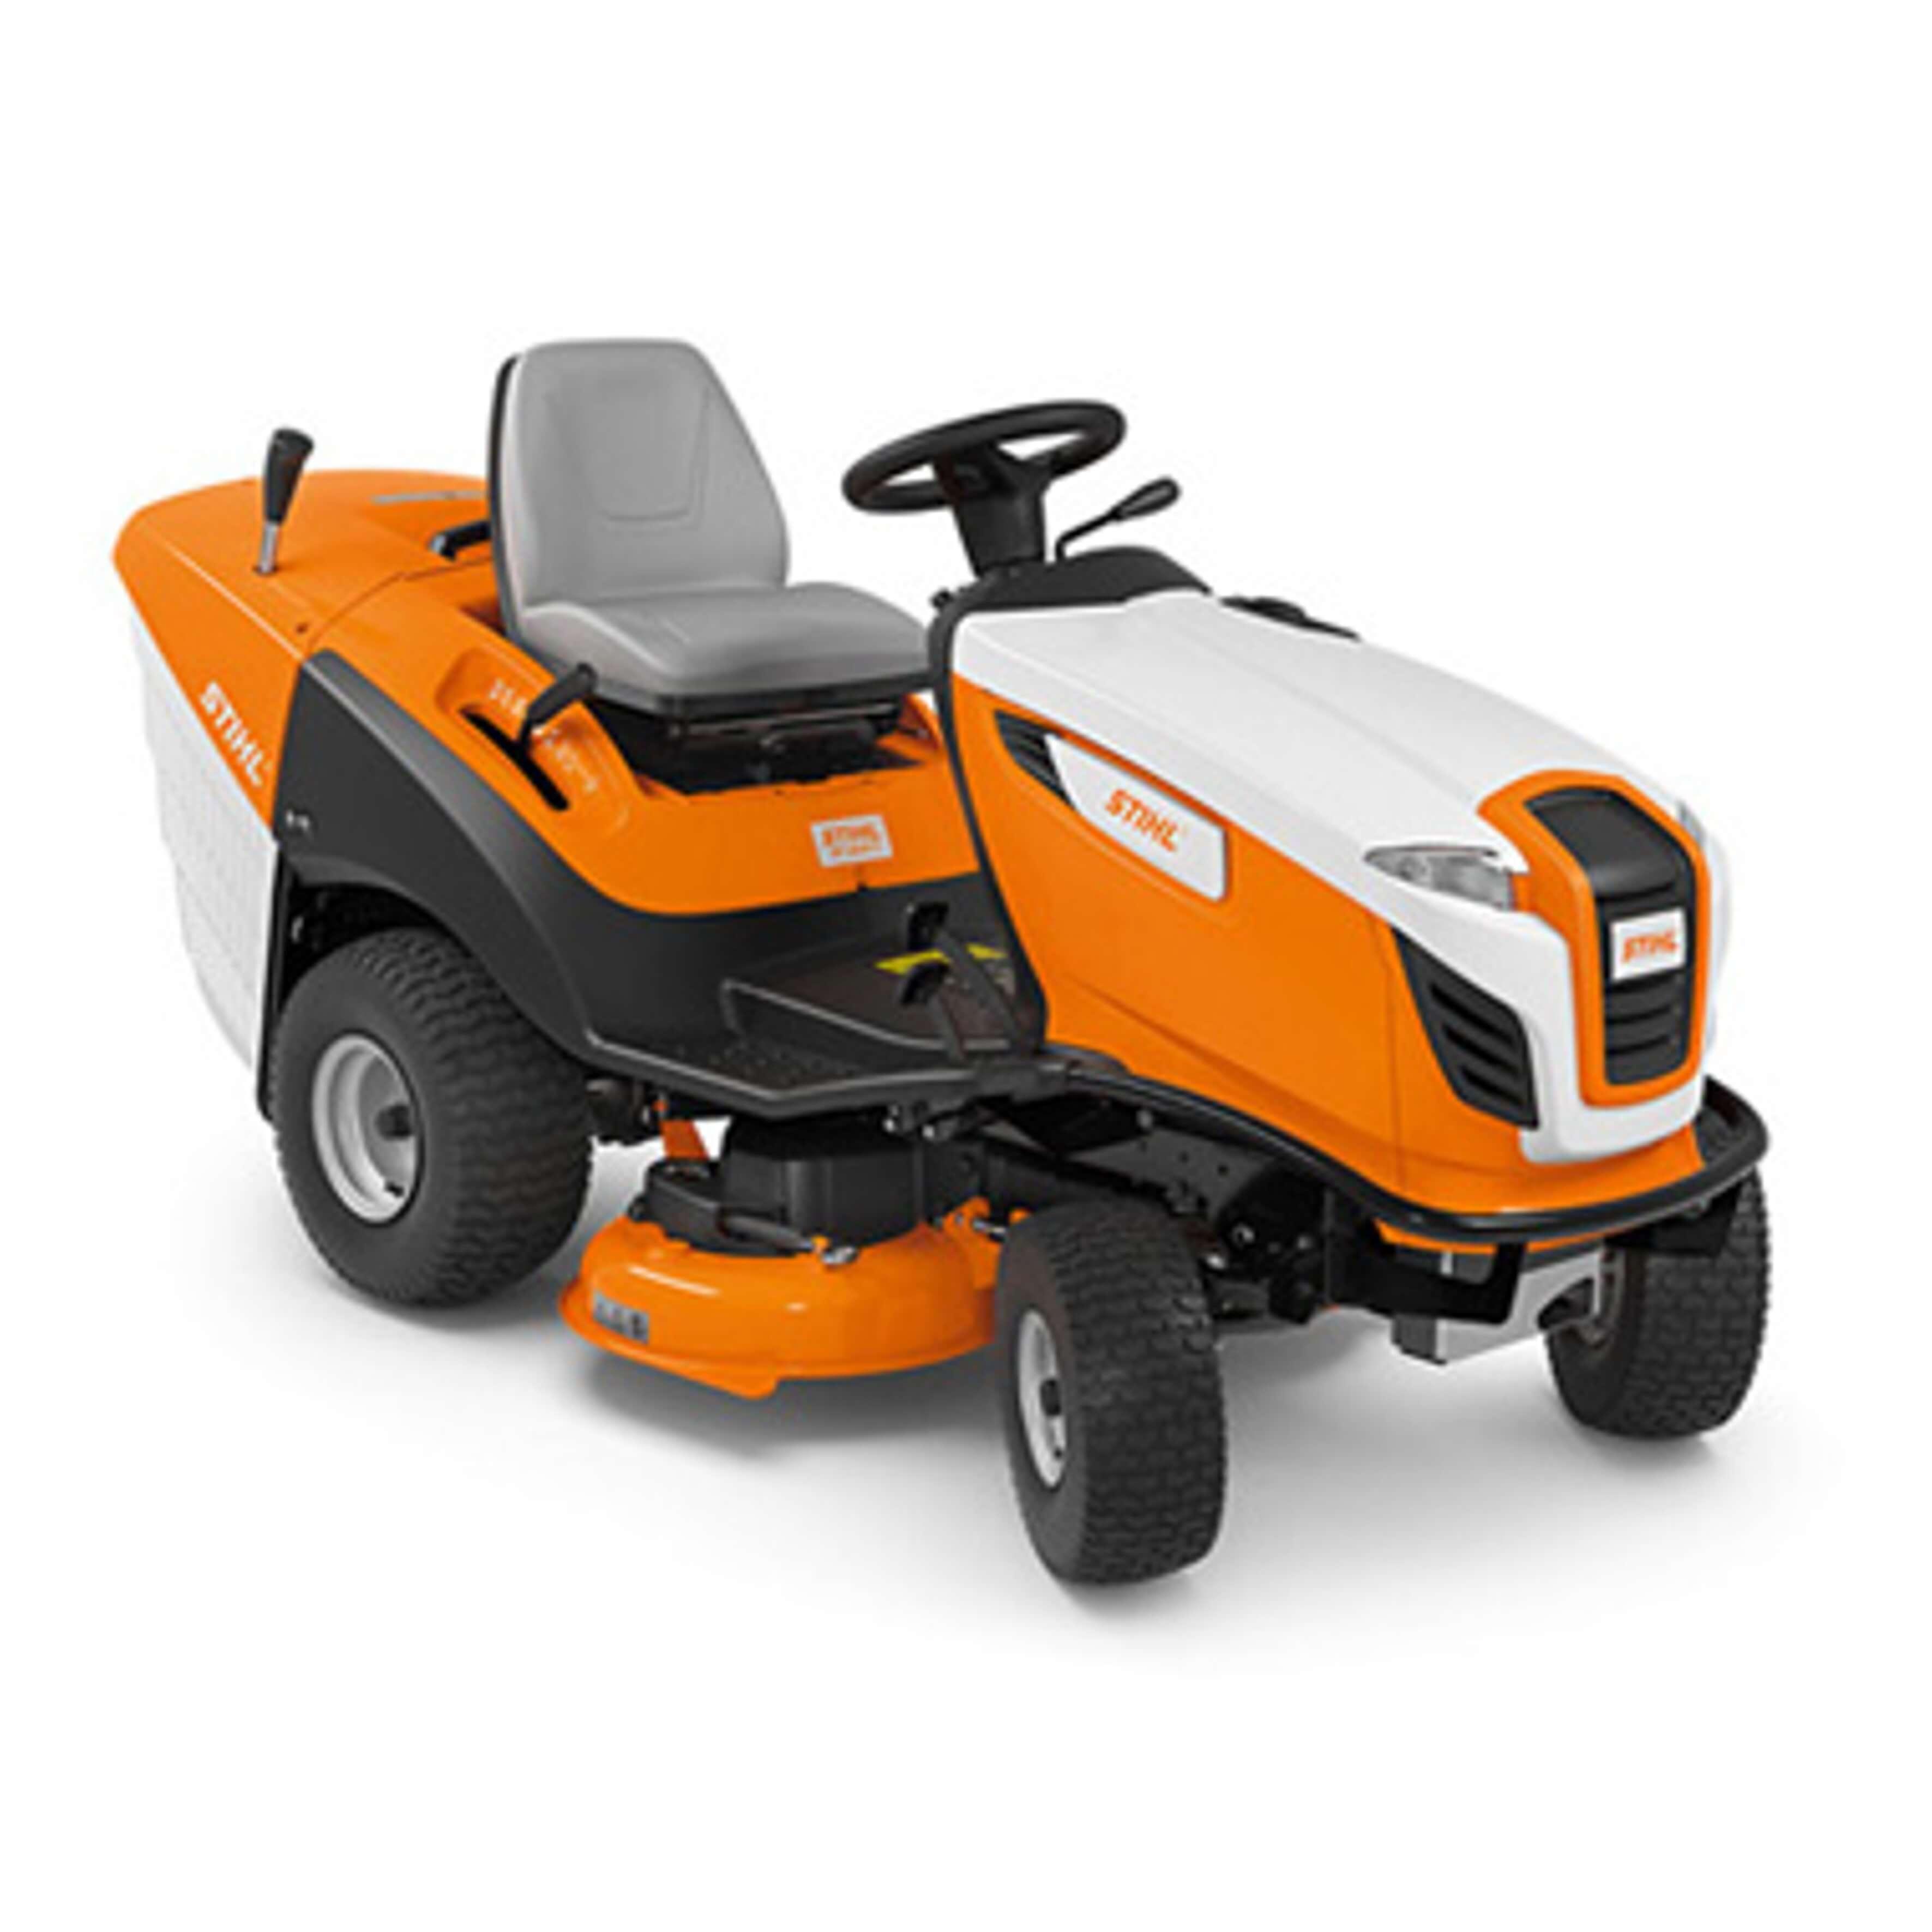 Stihl RT 5112.0 Z Ride on Mower Parts